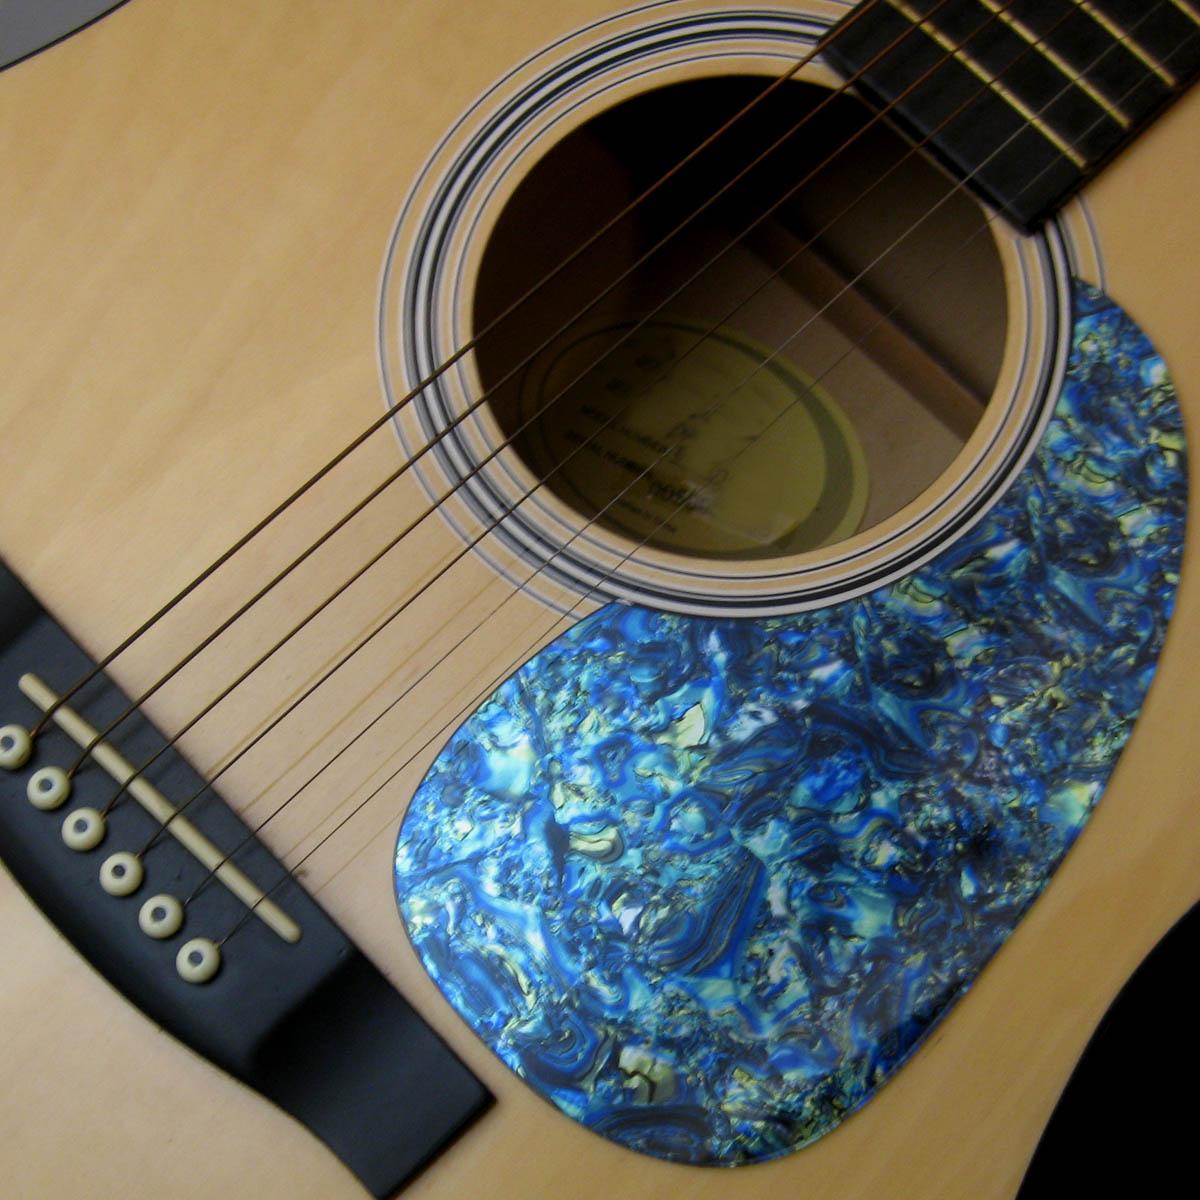 Acoustic Custom Pickguard - Iridescent Blue Abalone